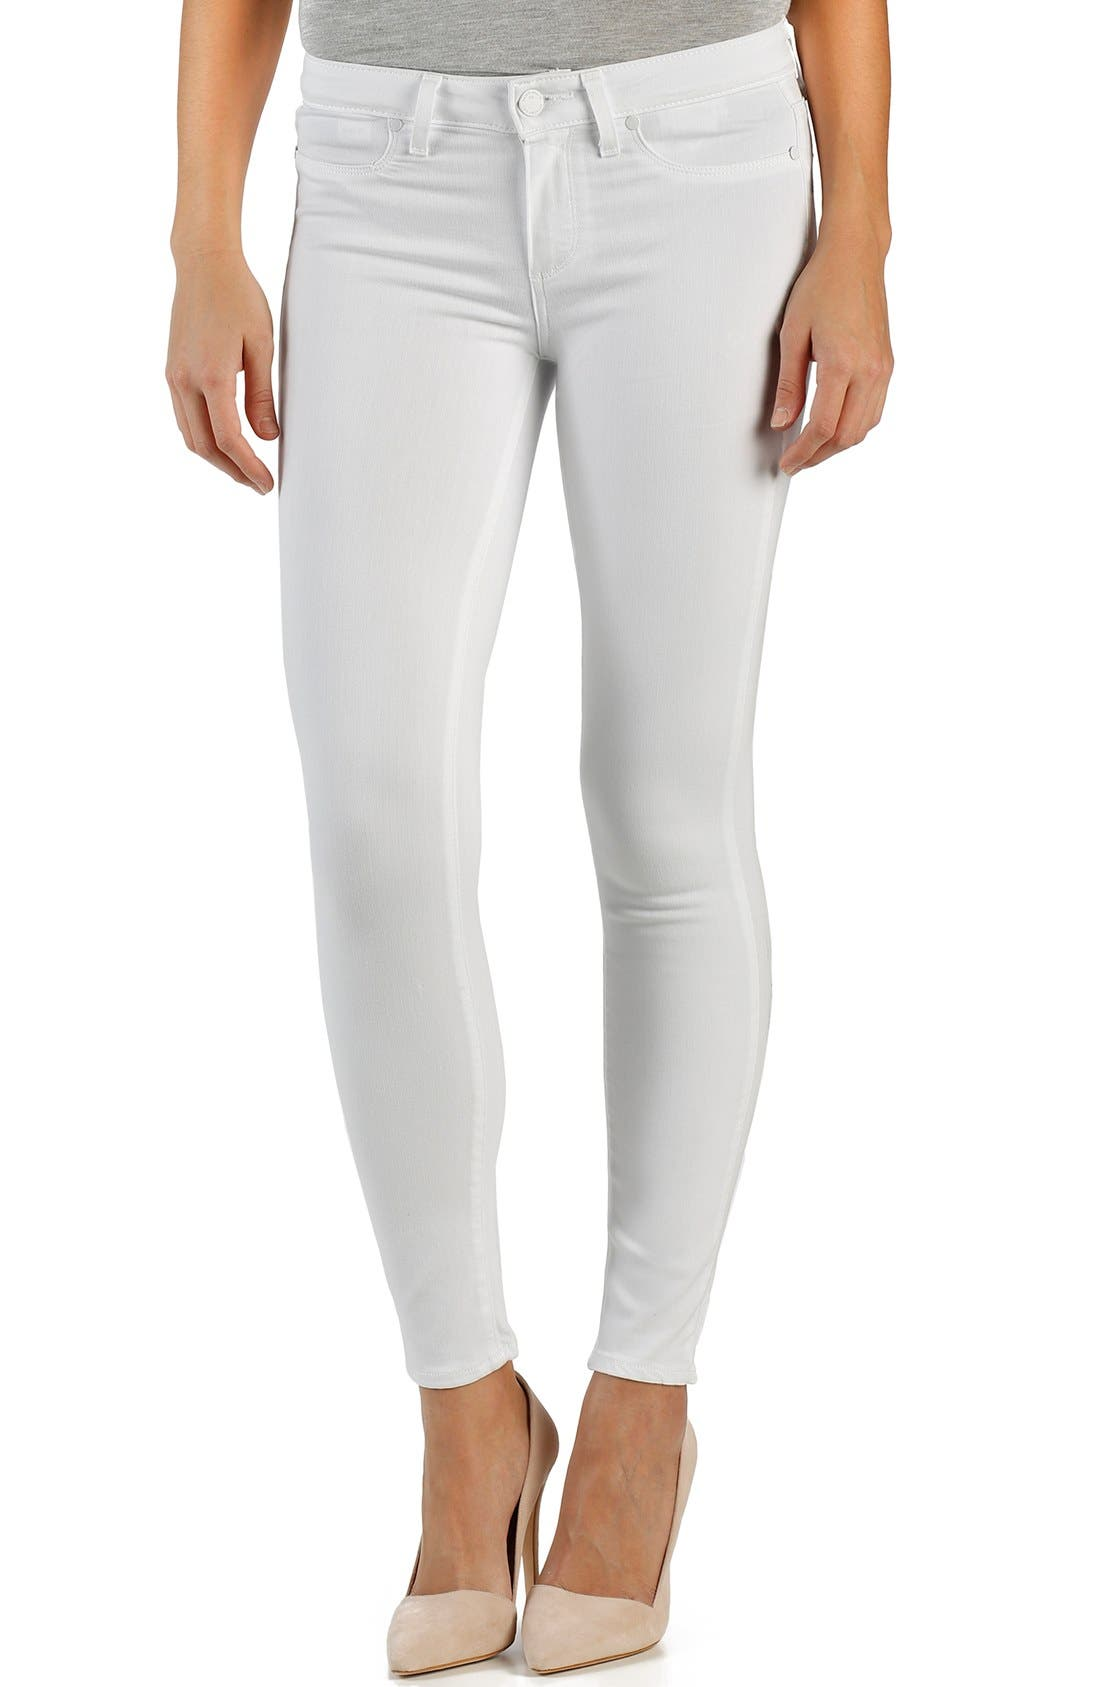 PAIGE Denim Transcend - Verdugo Ankle Skinny Jeans